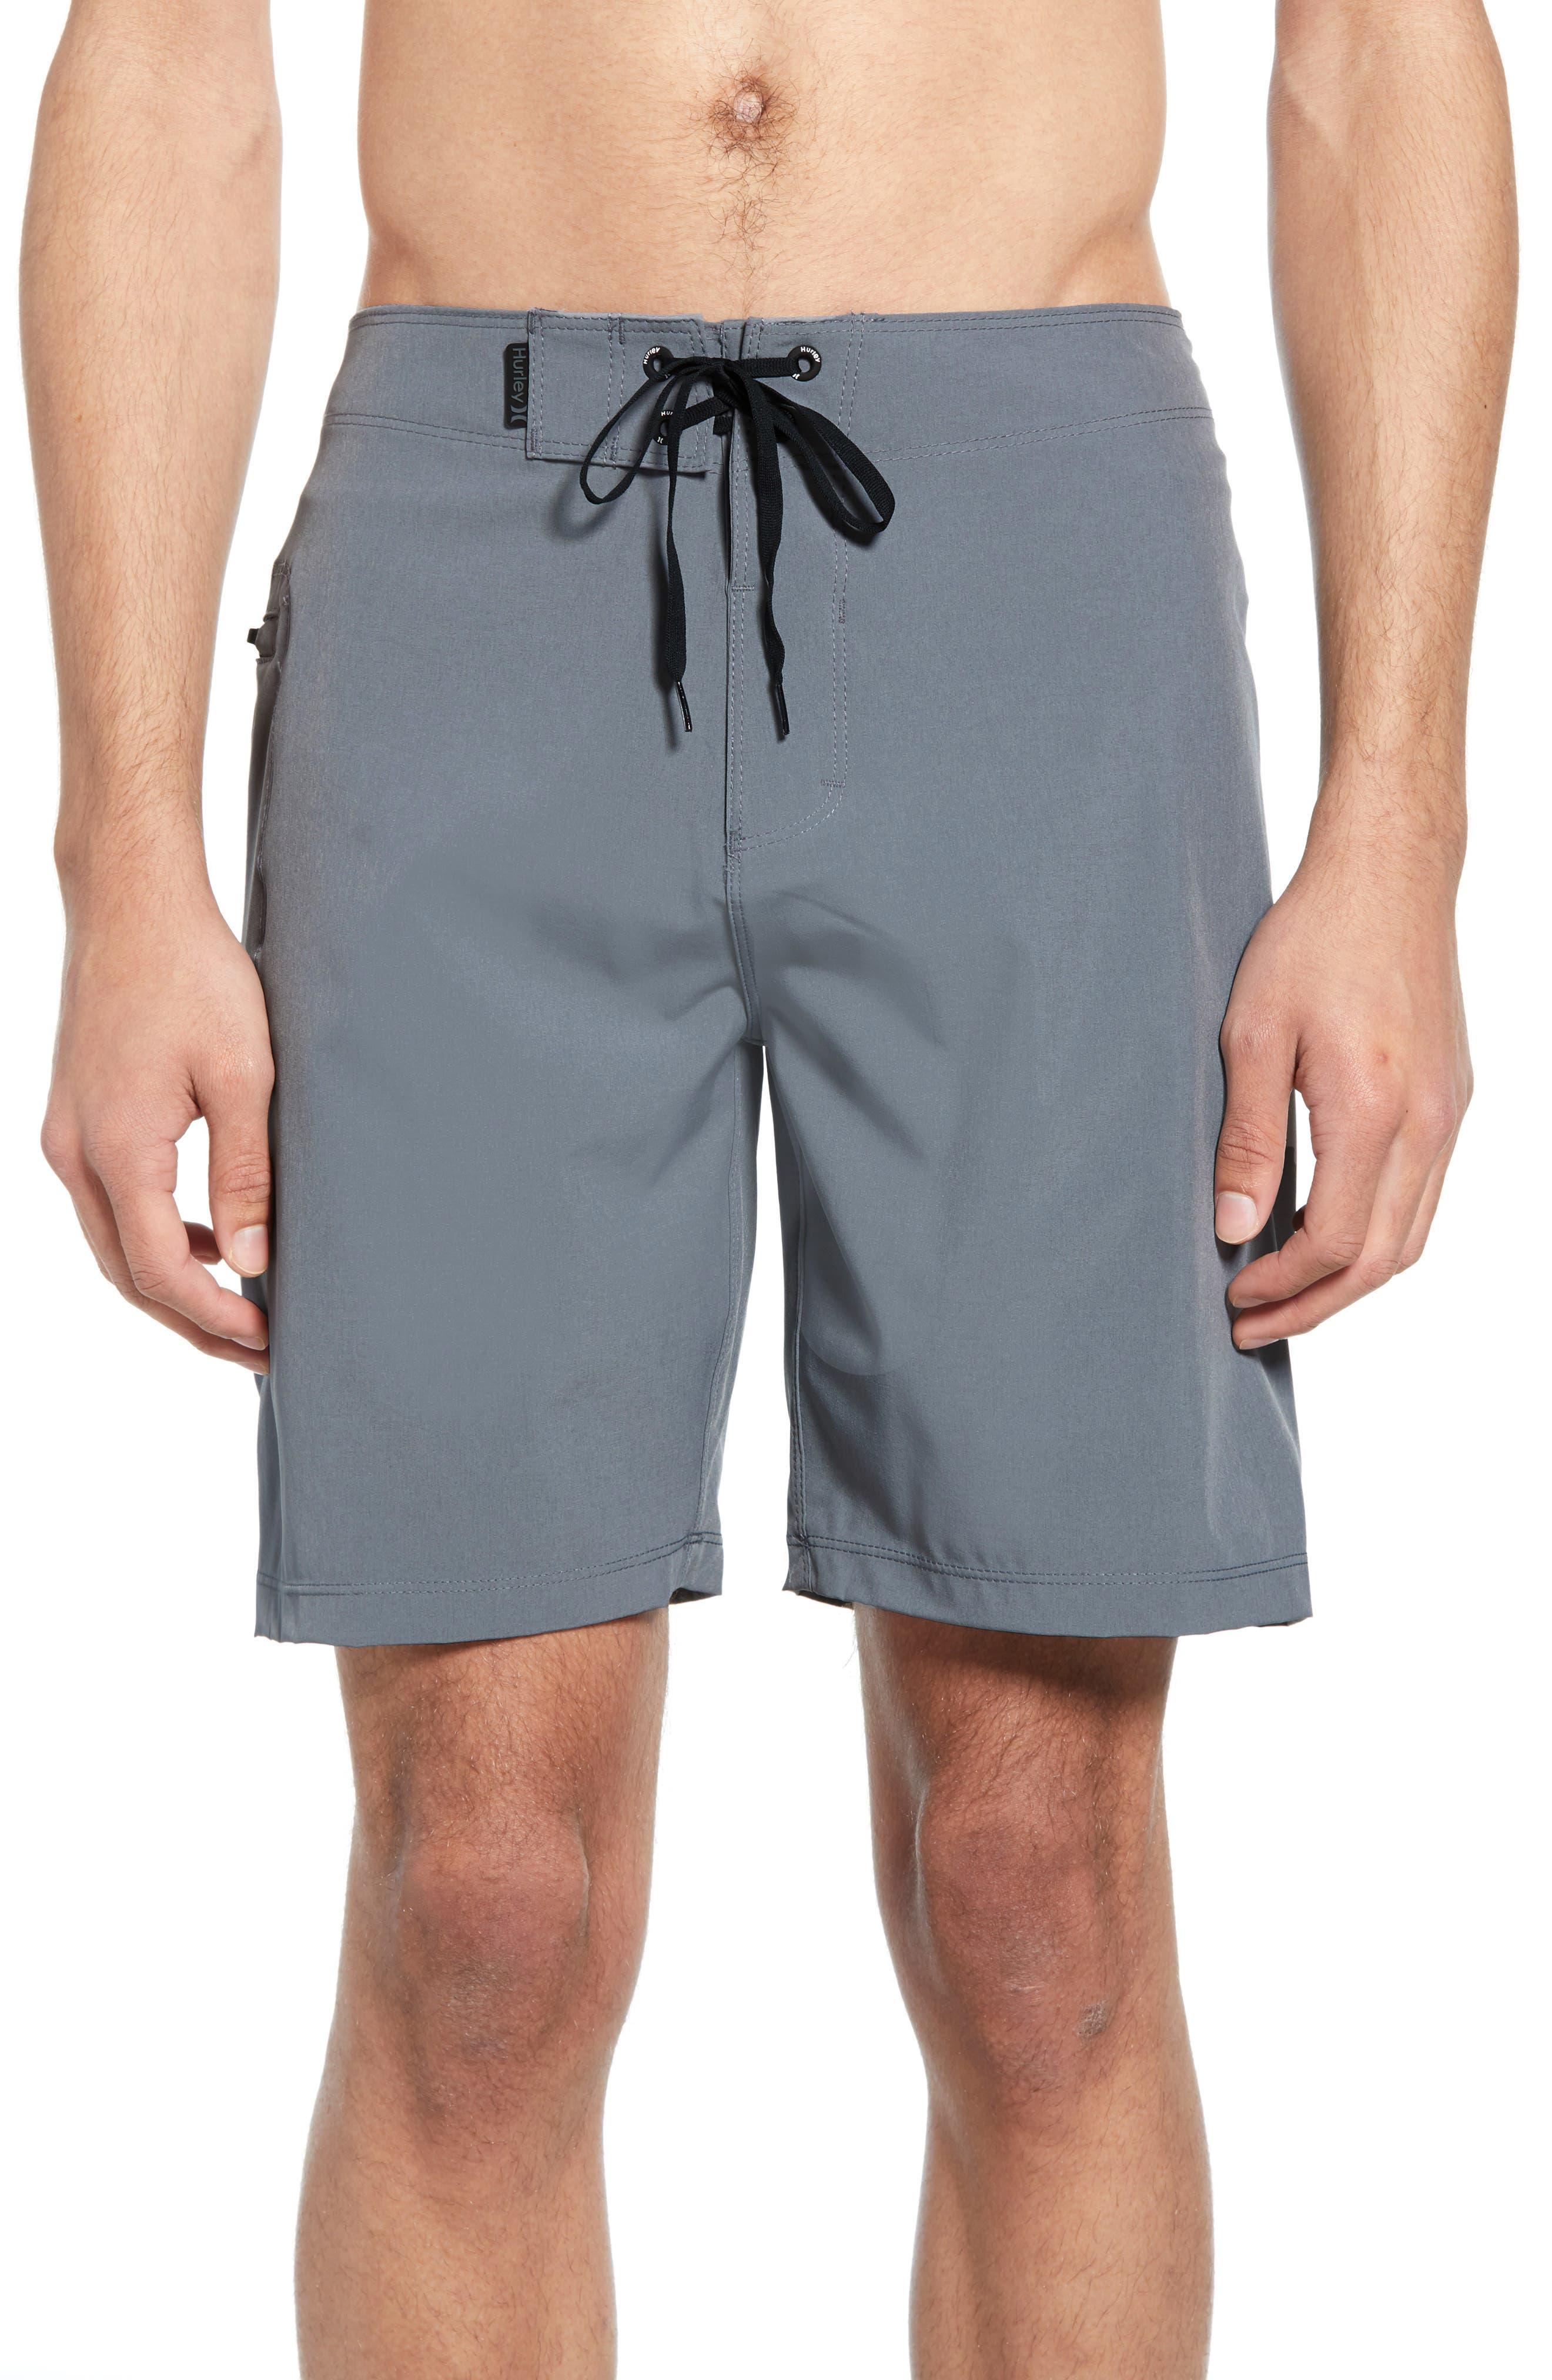 HURLEY, Phantom One & Only Board Shorts, Main thumbnail 1, color, COOL GREY